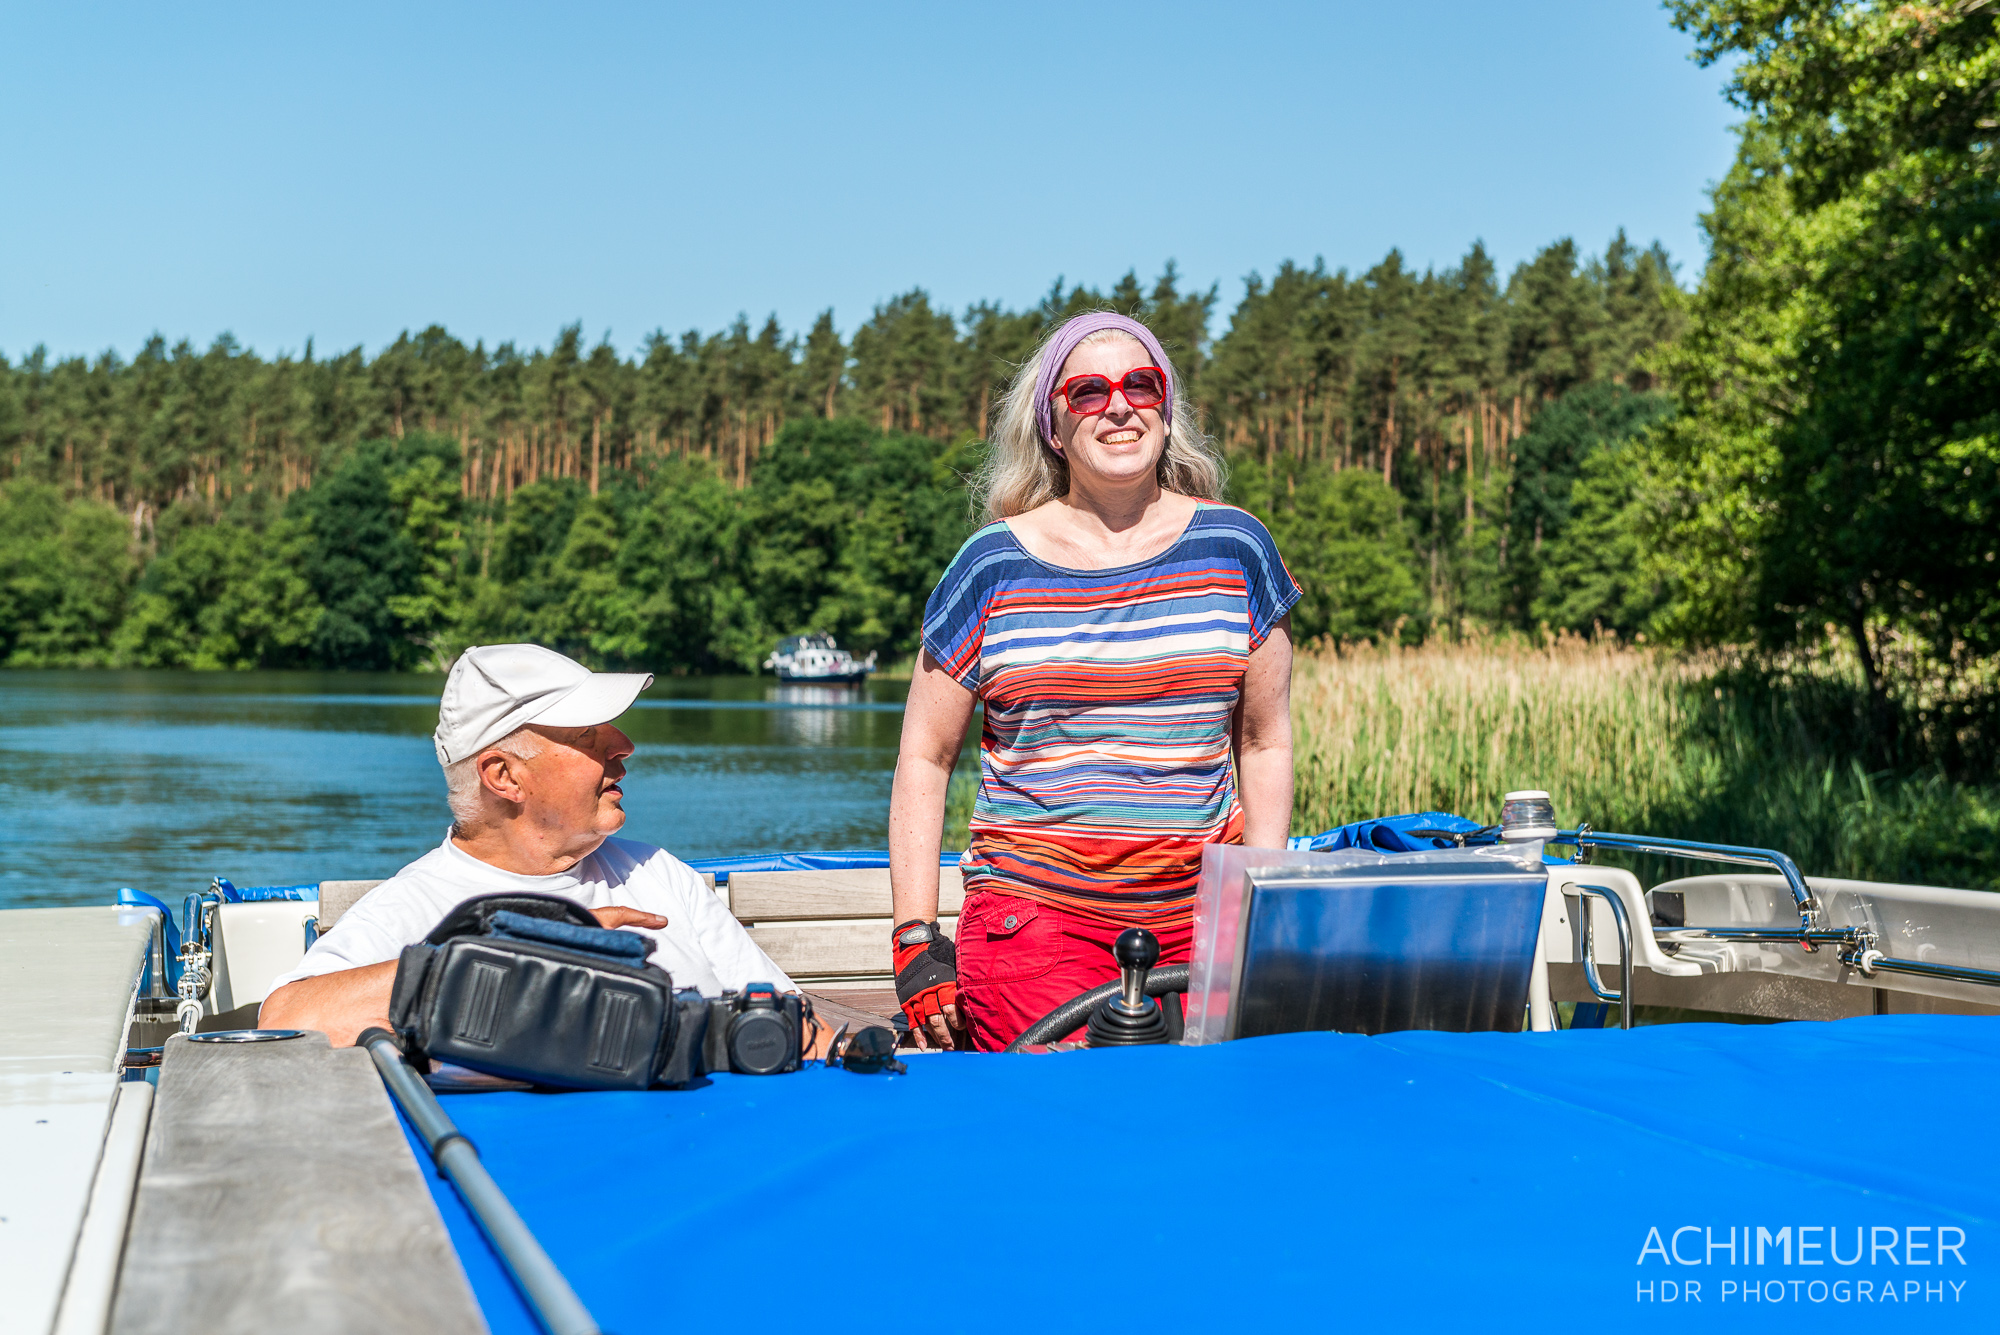 Hausboot-Kuhnle-Mueritz-Mecklenburg-Vorpommern-See_3135